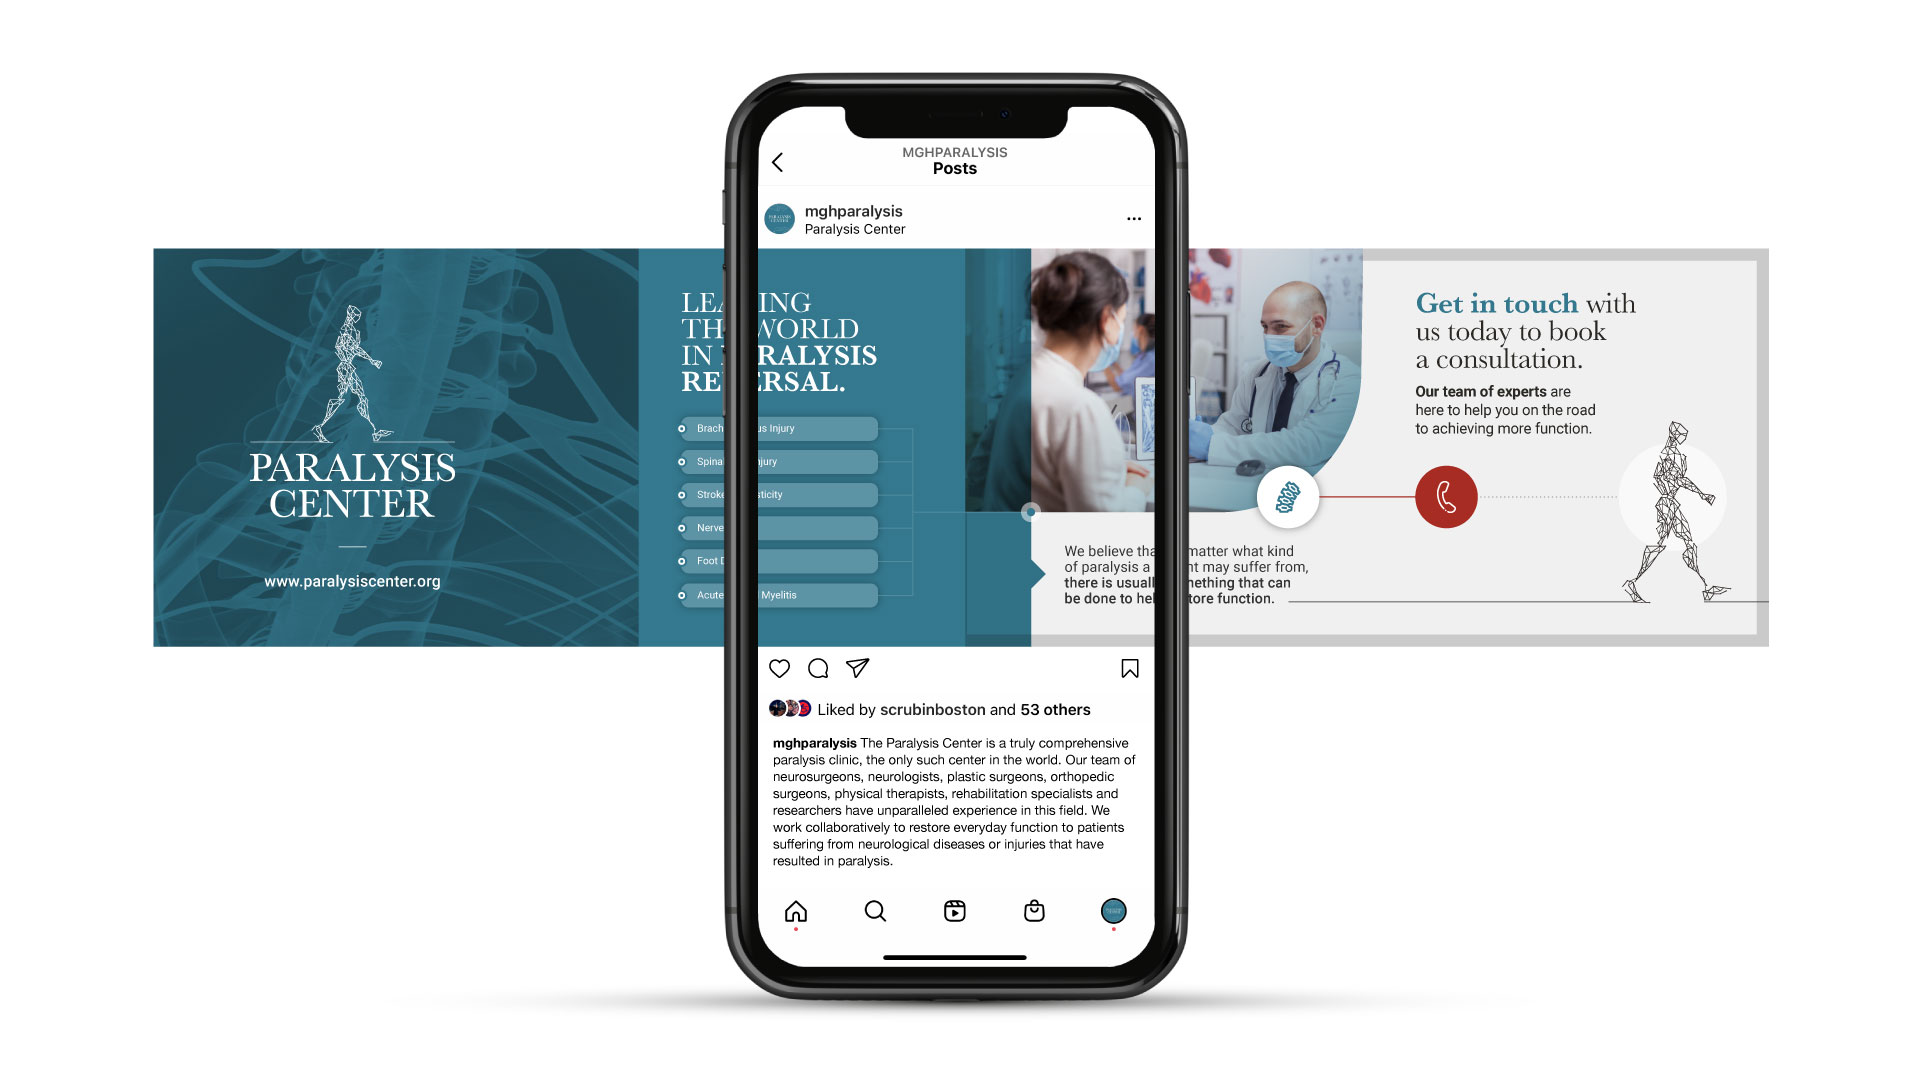 Paralysis Center social media marketing mobile device showing instagram designs.